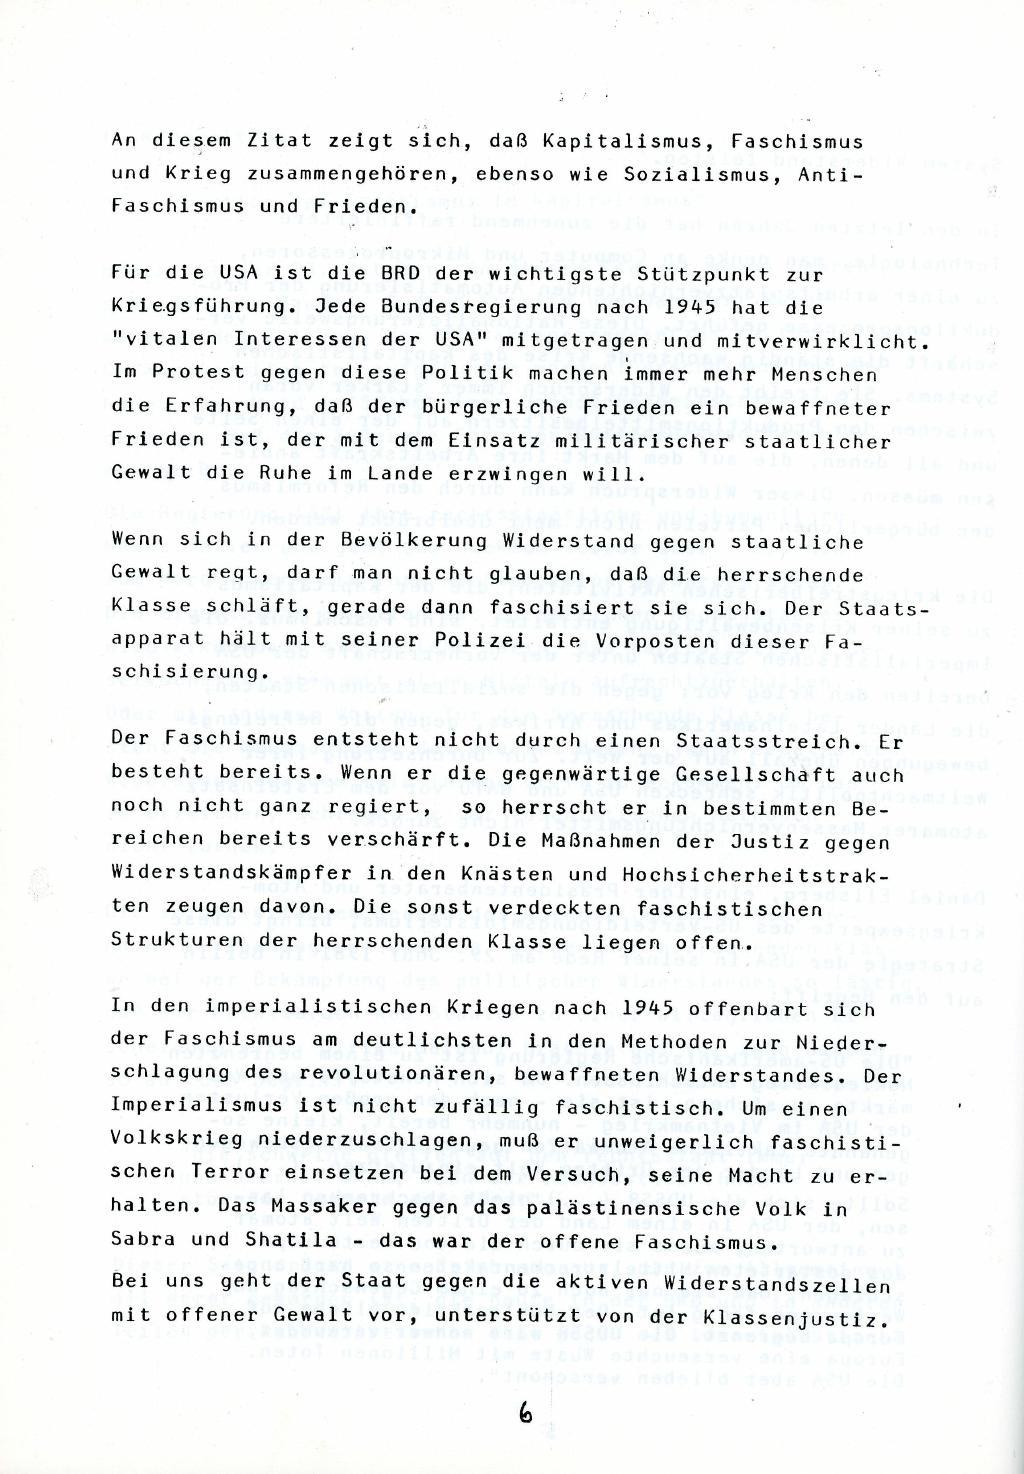 Berlin_1983_Autonome_Gruppen_Faschismus_im_Kapitalismus_06